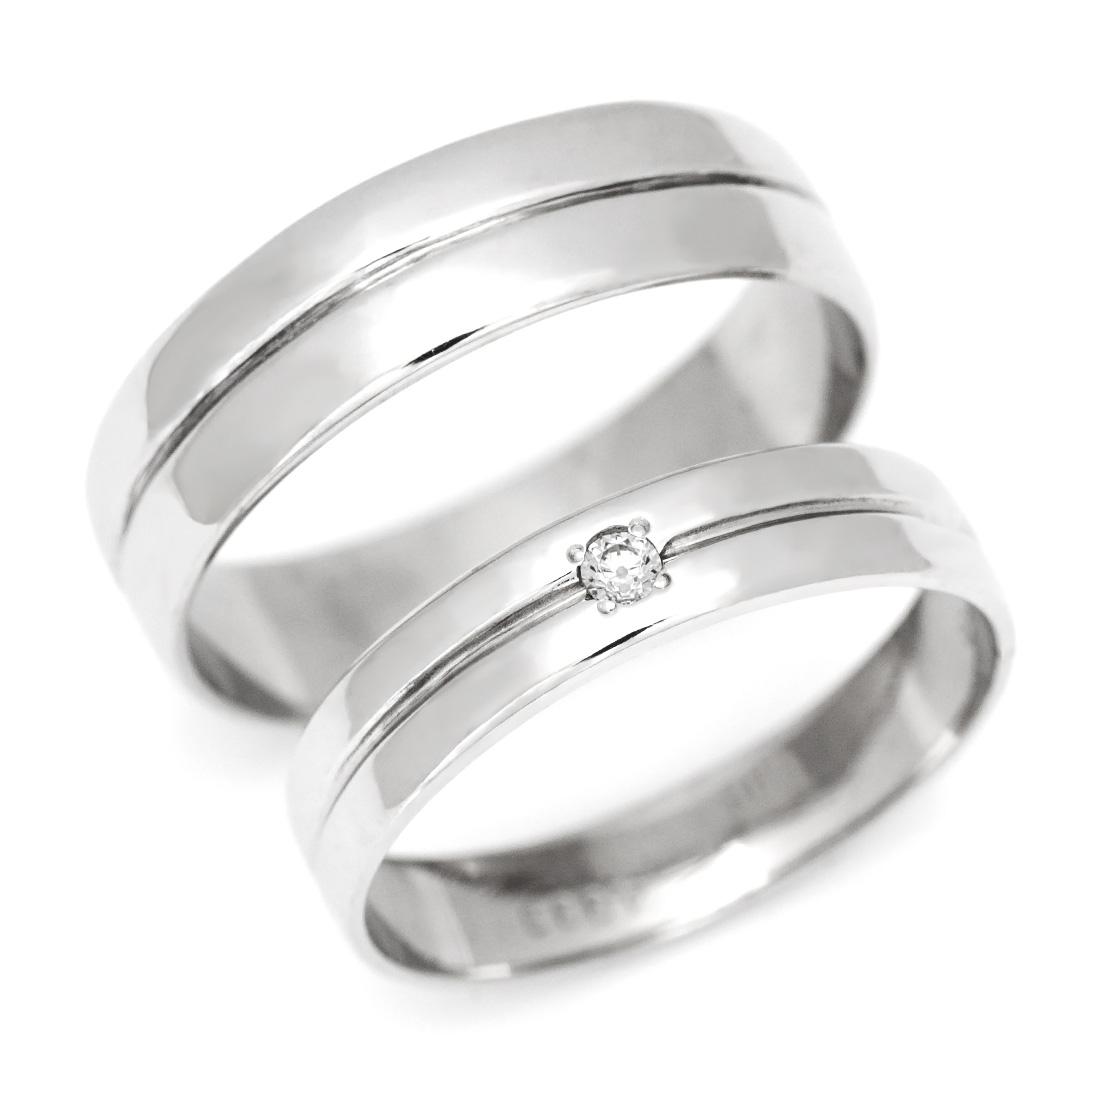 【GWクーポン配布中】マリッジリング ダイヤモンド 「Flat」 プラチナ900 (レディース:1~20号 メンズ:10~29号)